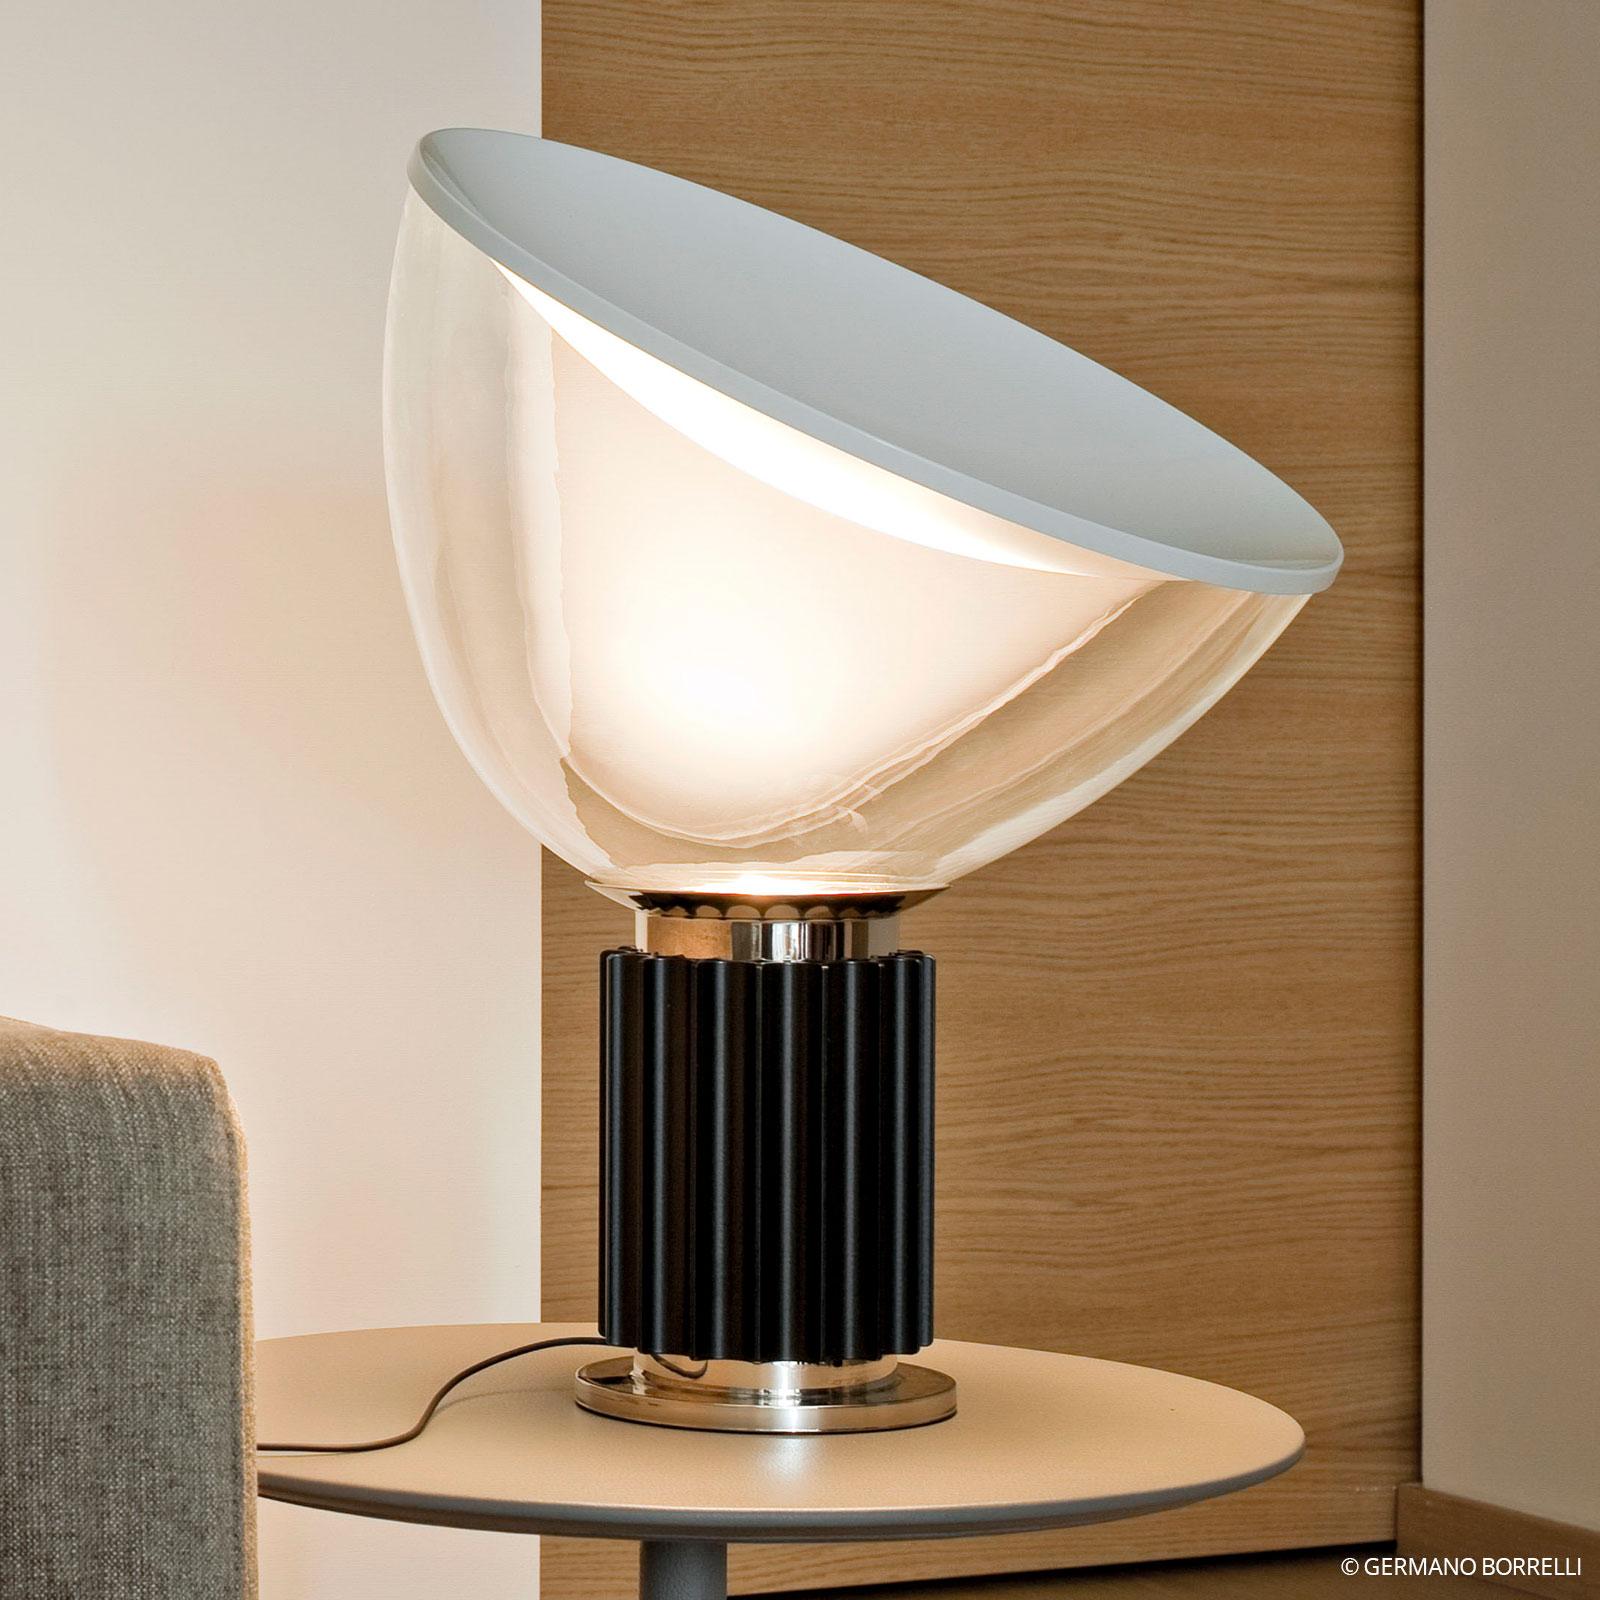 Lampada da tavolo a LED Taccia small, nero